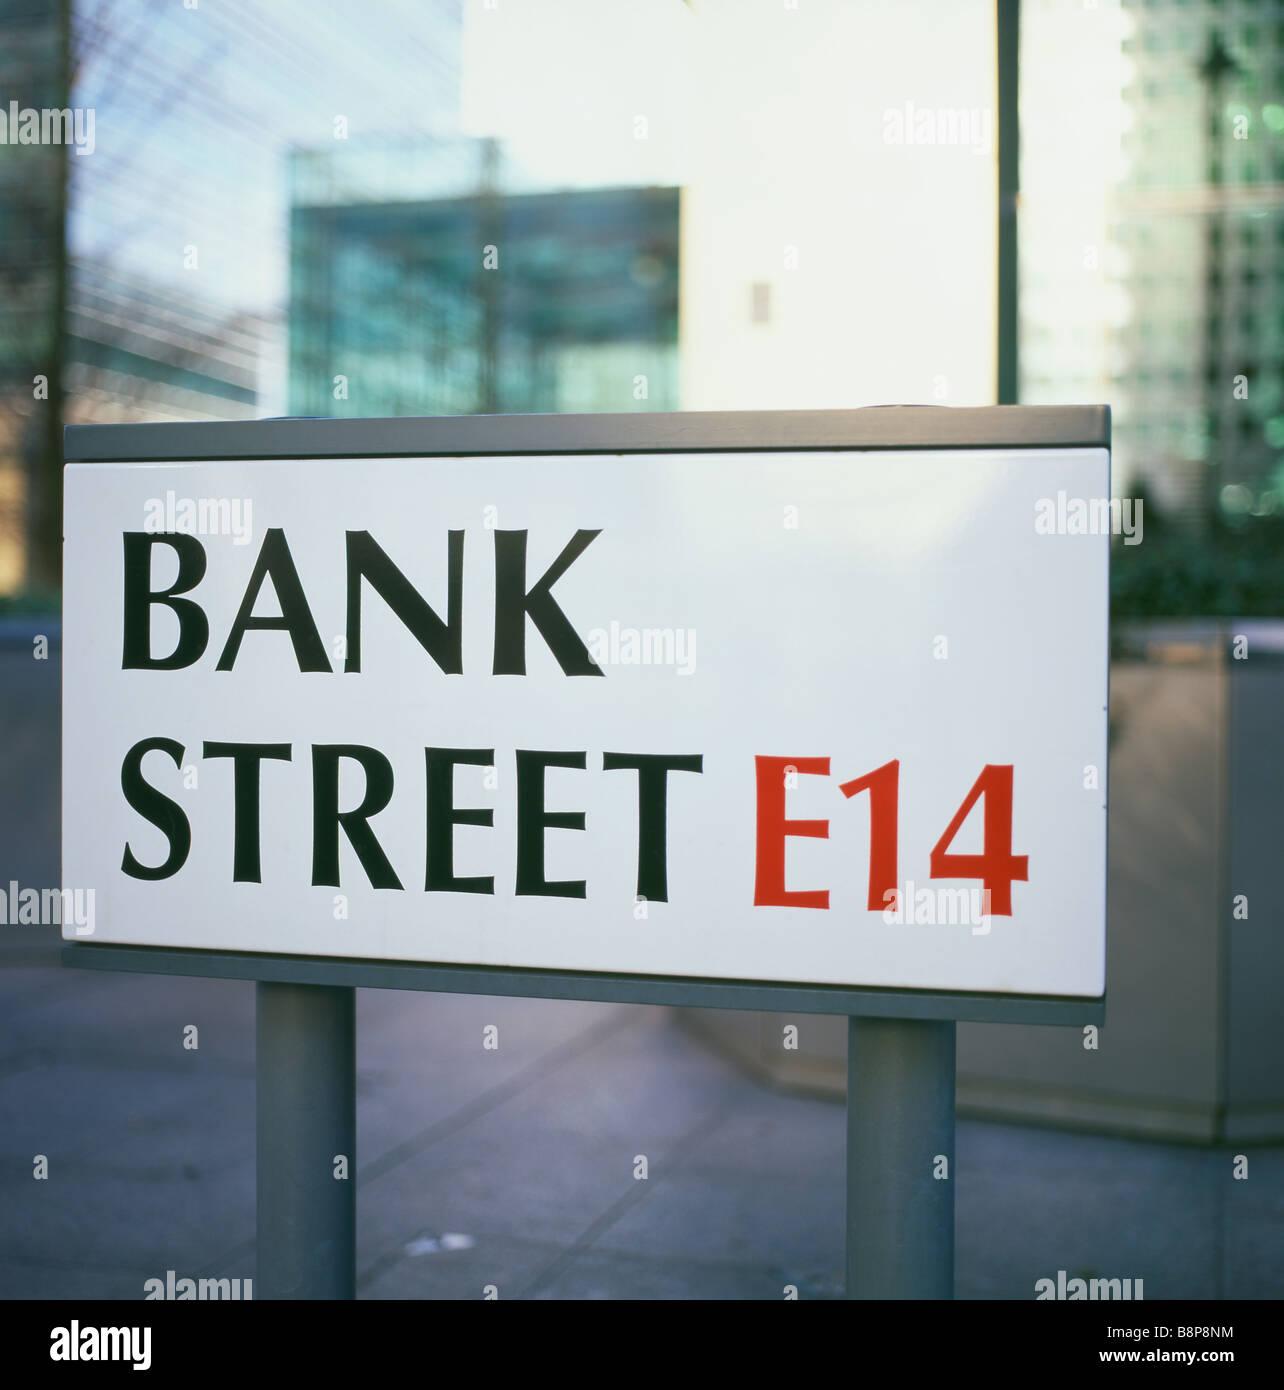 Bank Street E14 street sign in Canary Wharf,  London England UK   KATHY DEWITT - Stock Image